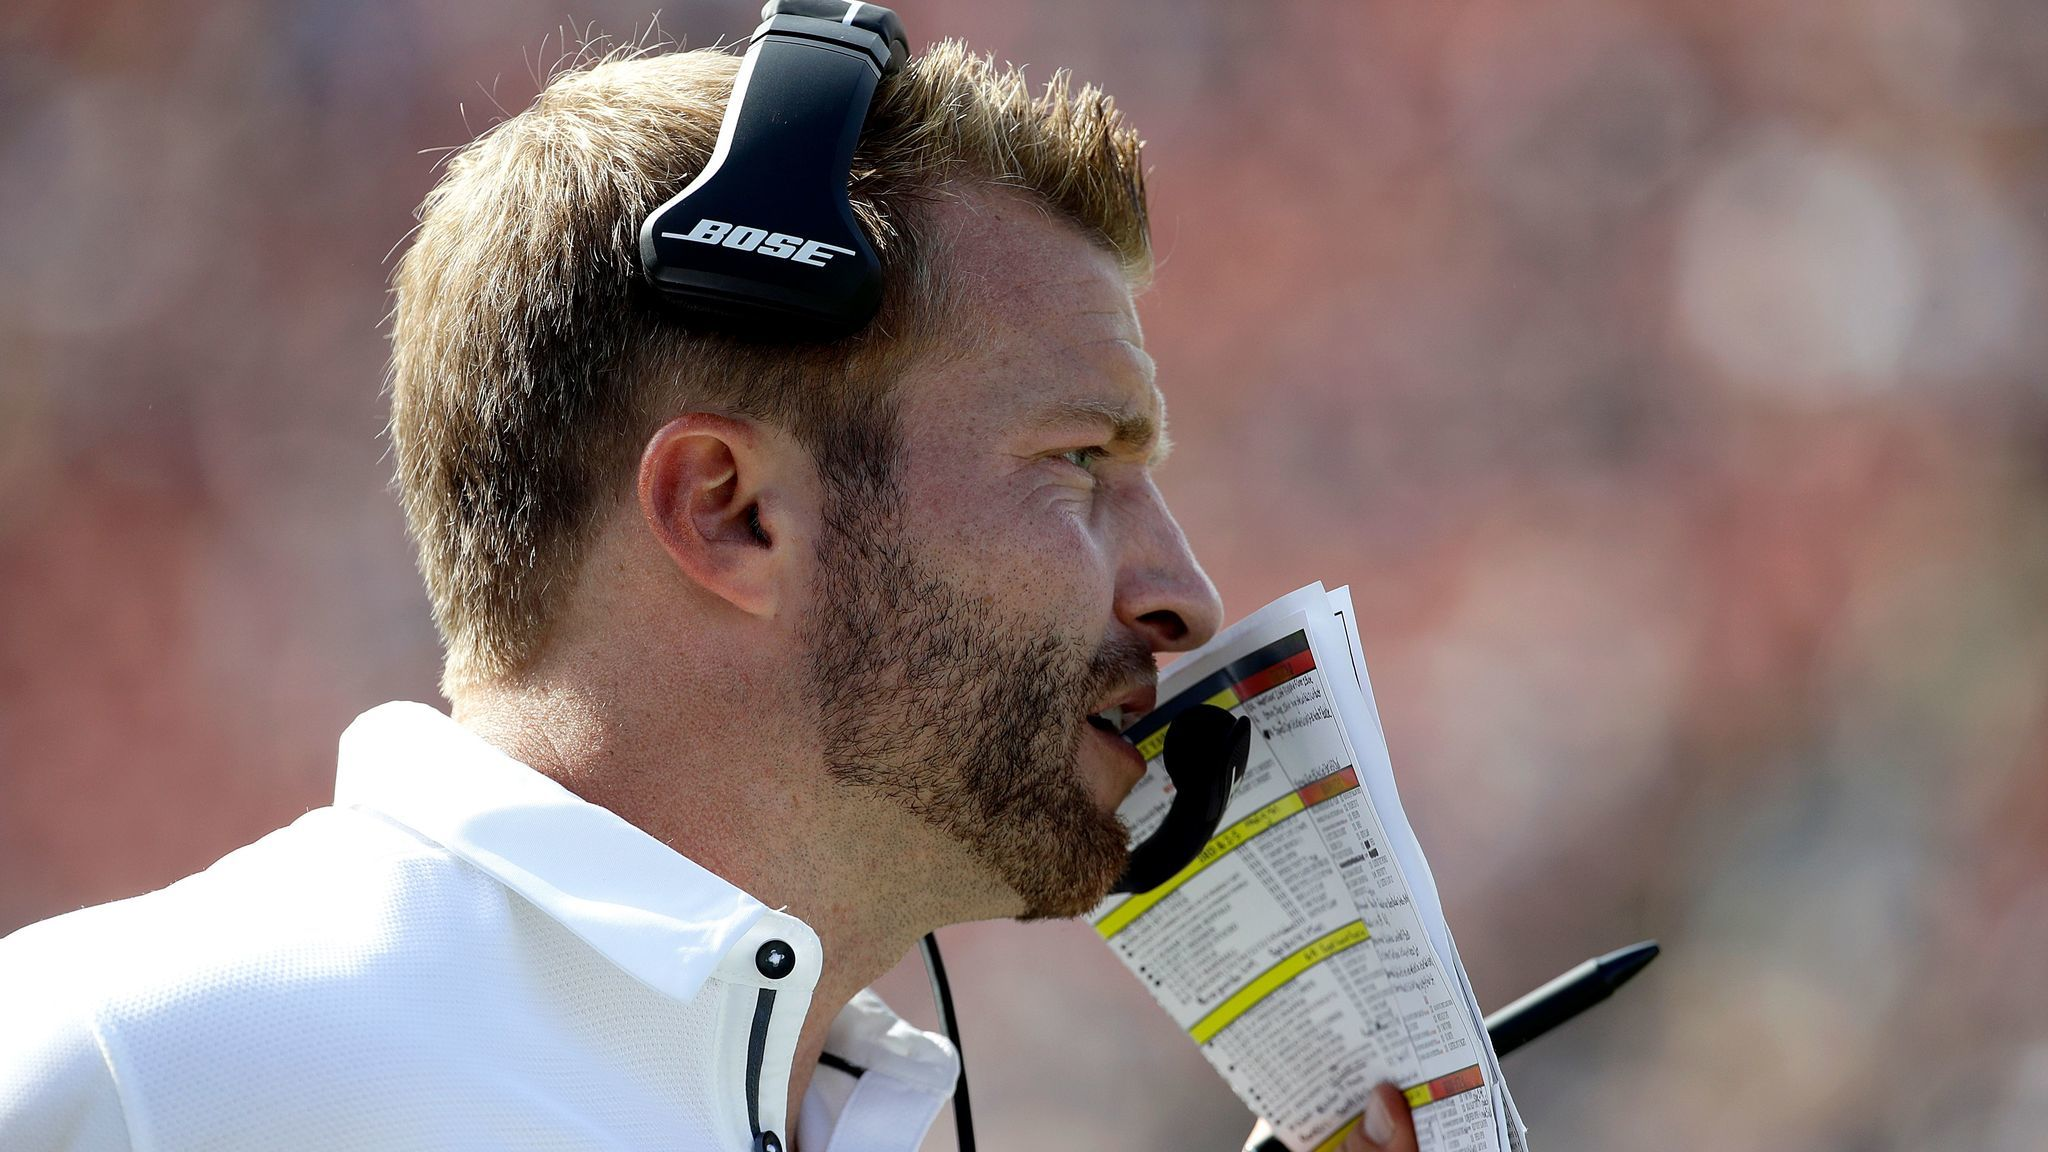 Rams coach Sean McVay is seen during a game against the Colts at the Coliseum. (Alex Gallardo / Associated Press)